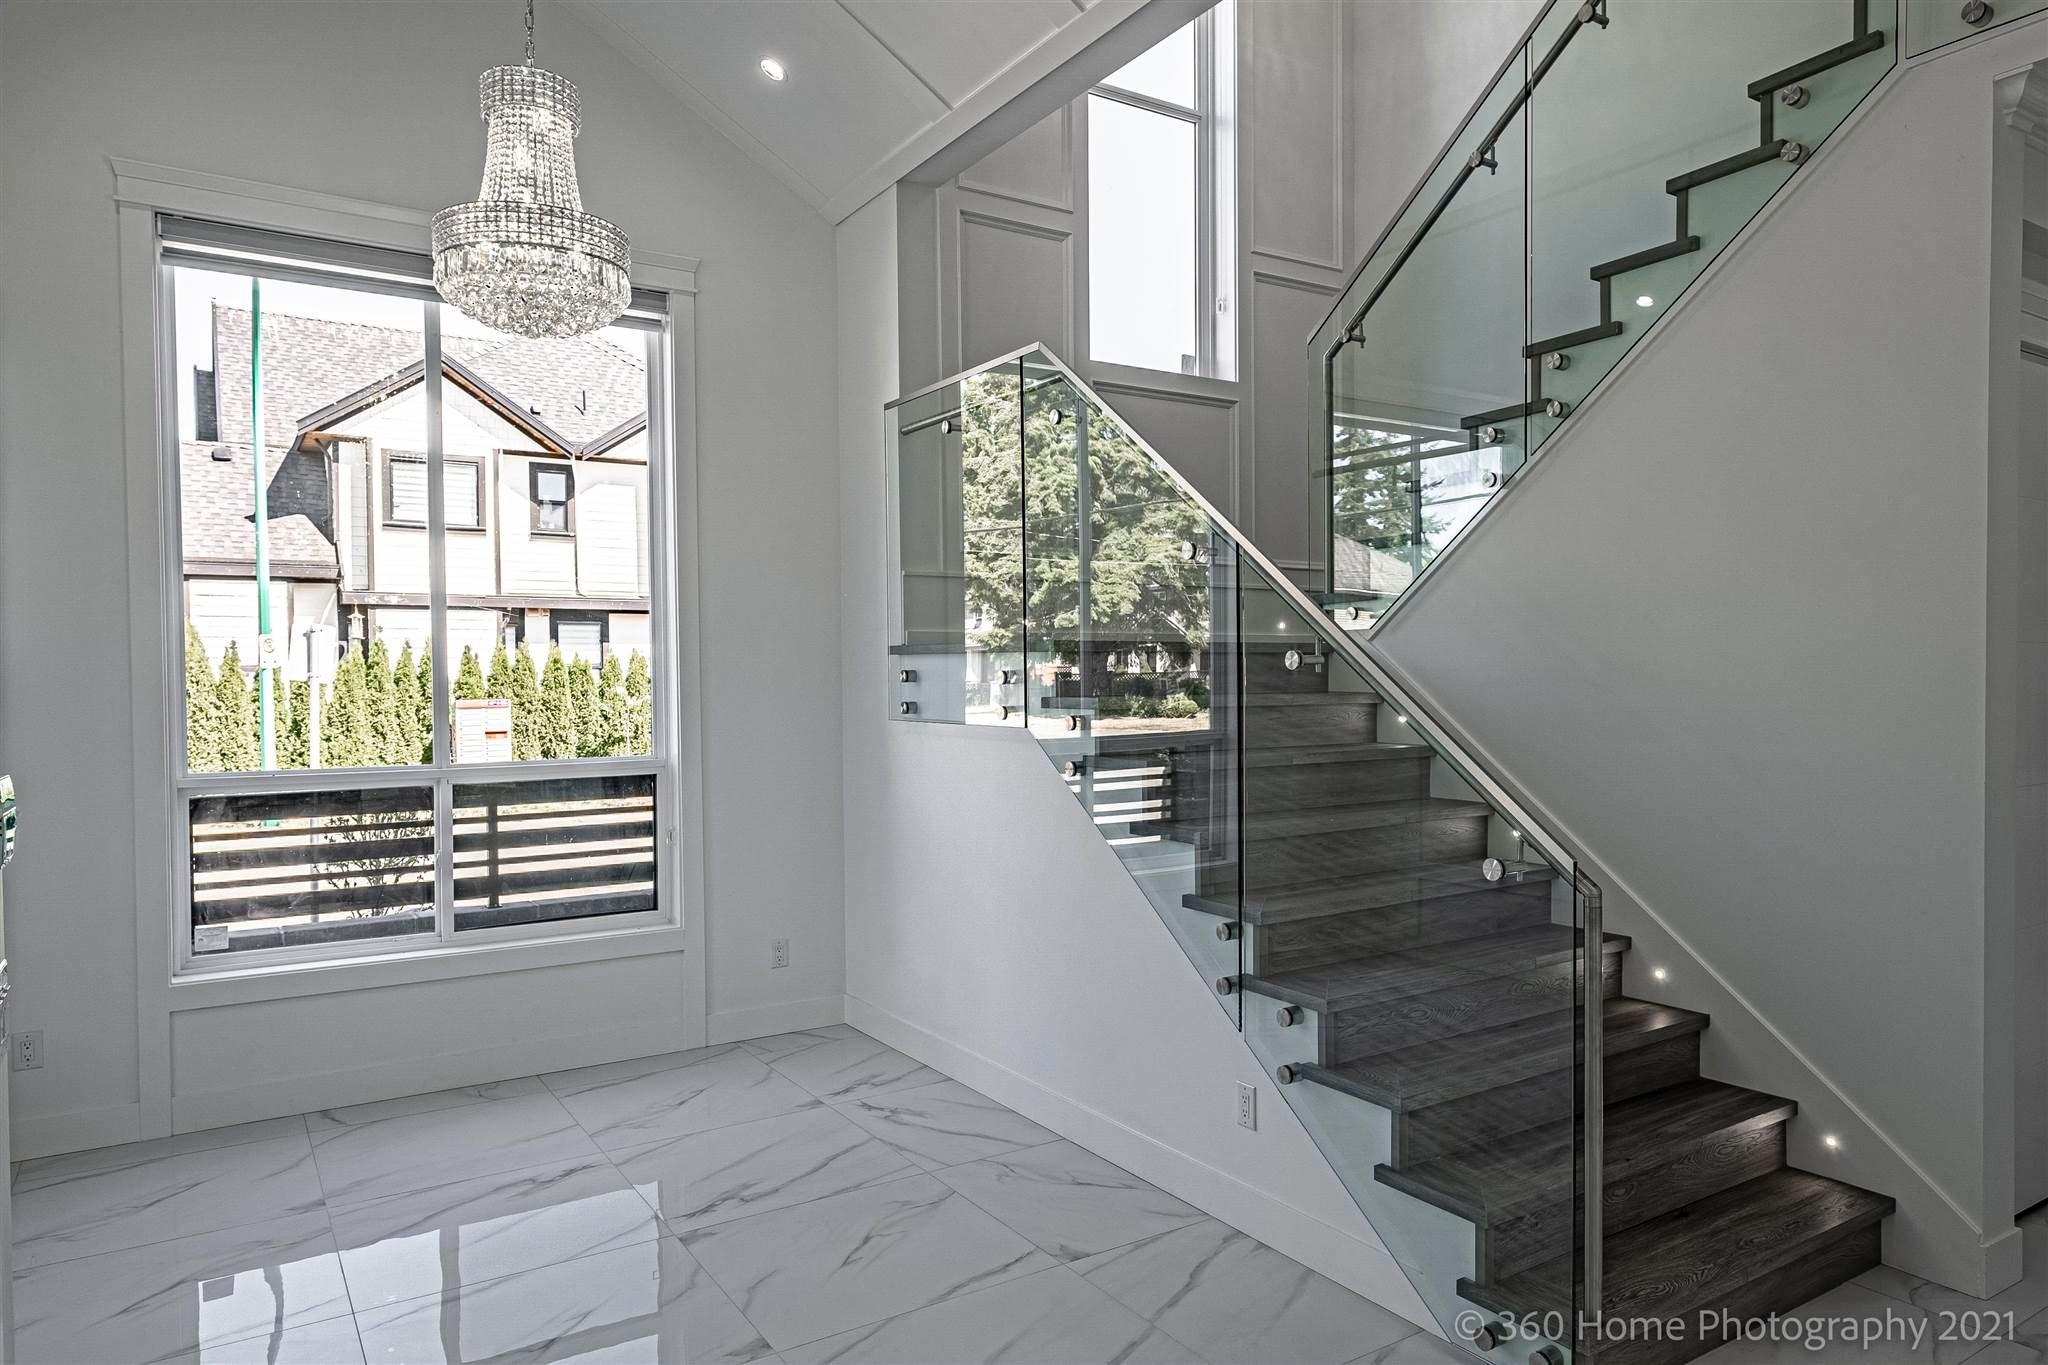 13050 101B AVENUE - Cedar Hills House/Single Family for sale, 5 Bedrooms (R2602208) - #8